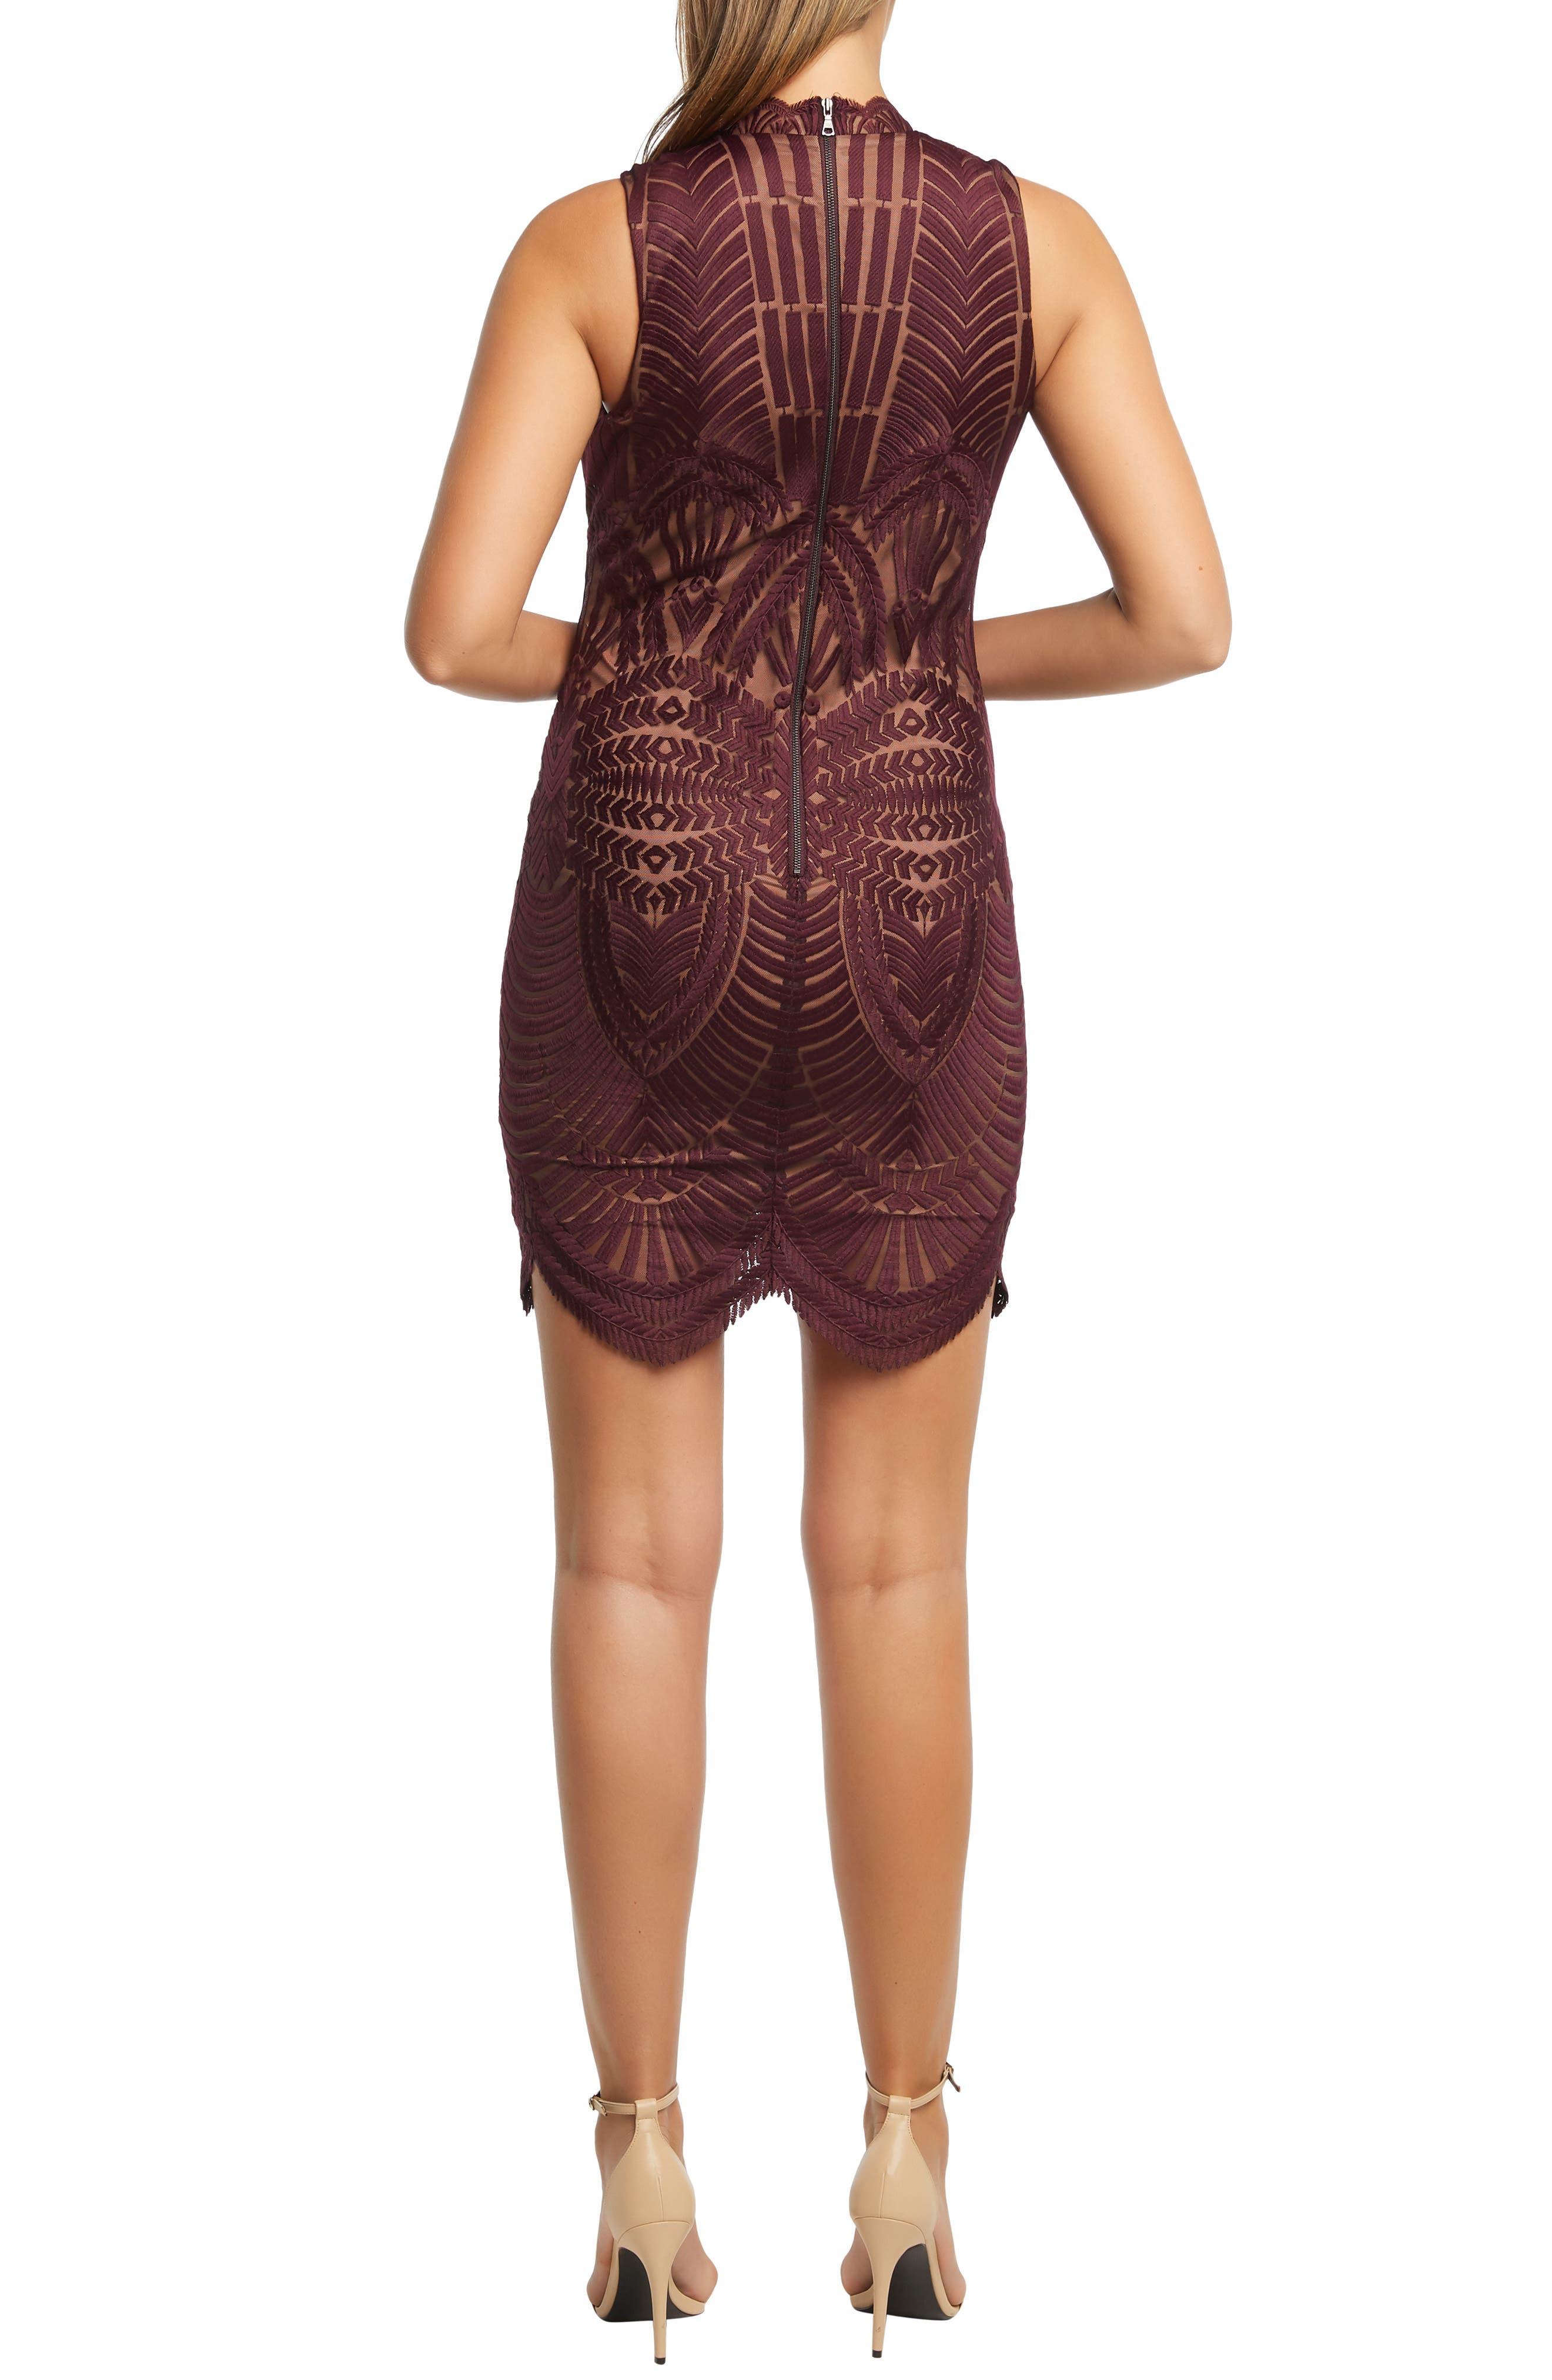 BARDOT, Alice Lace Body-Con Dress, Alternate thumbnail 2, color, 608